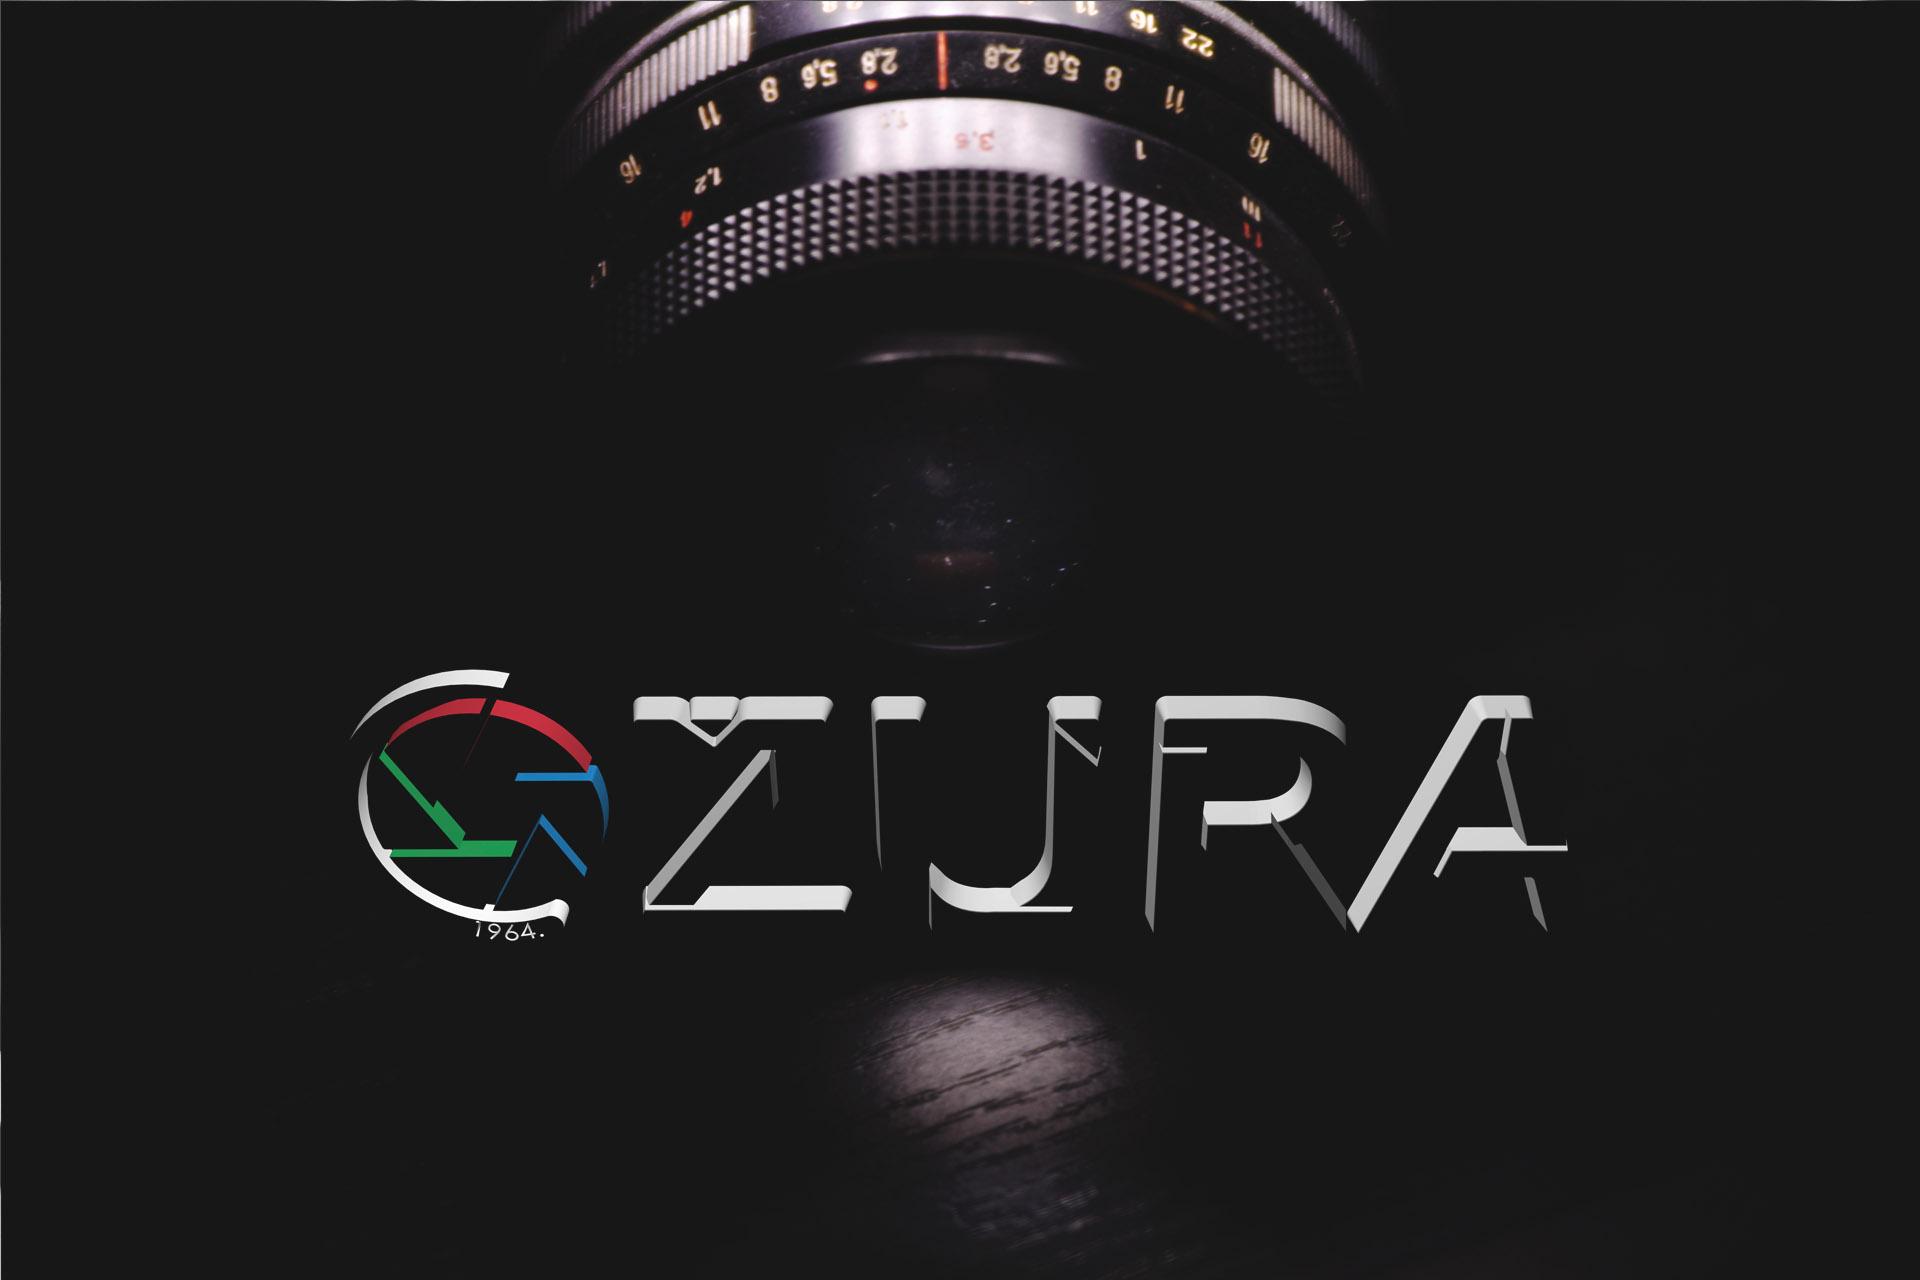 Studio Zura